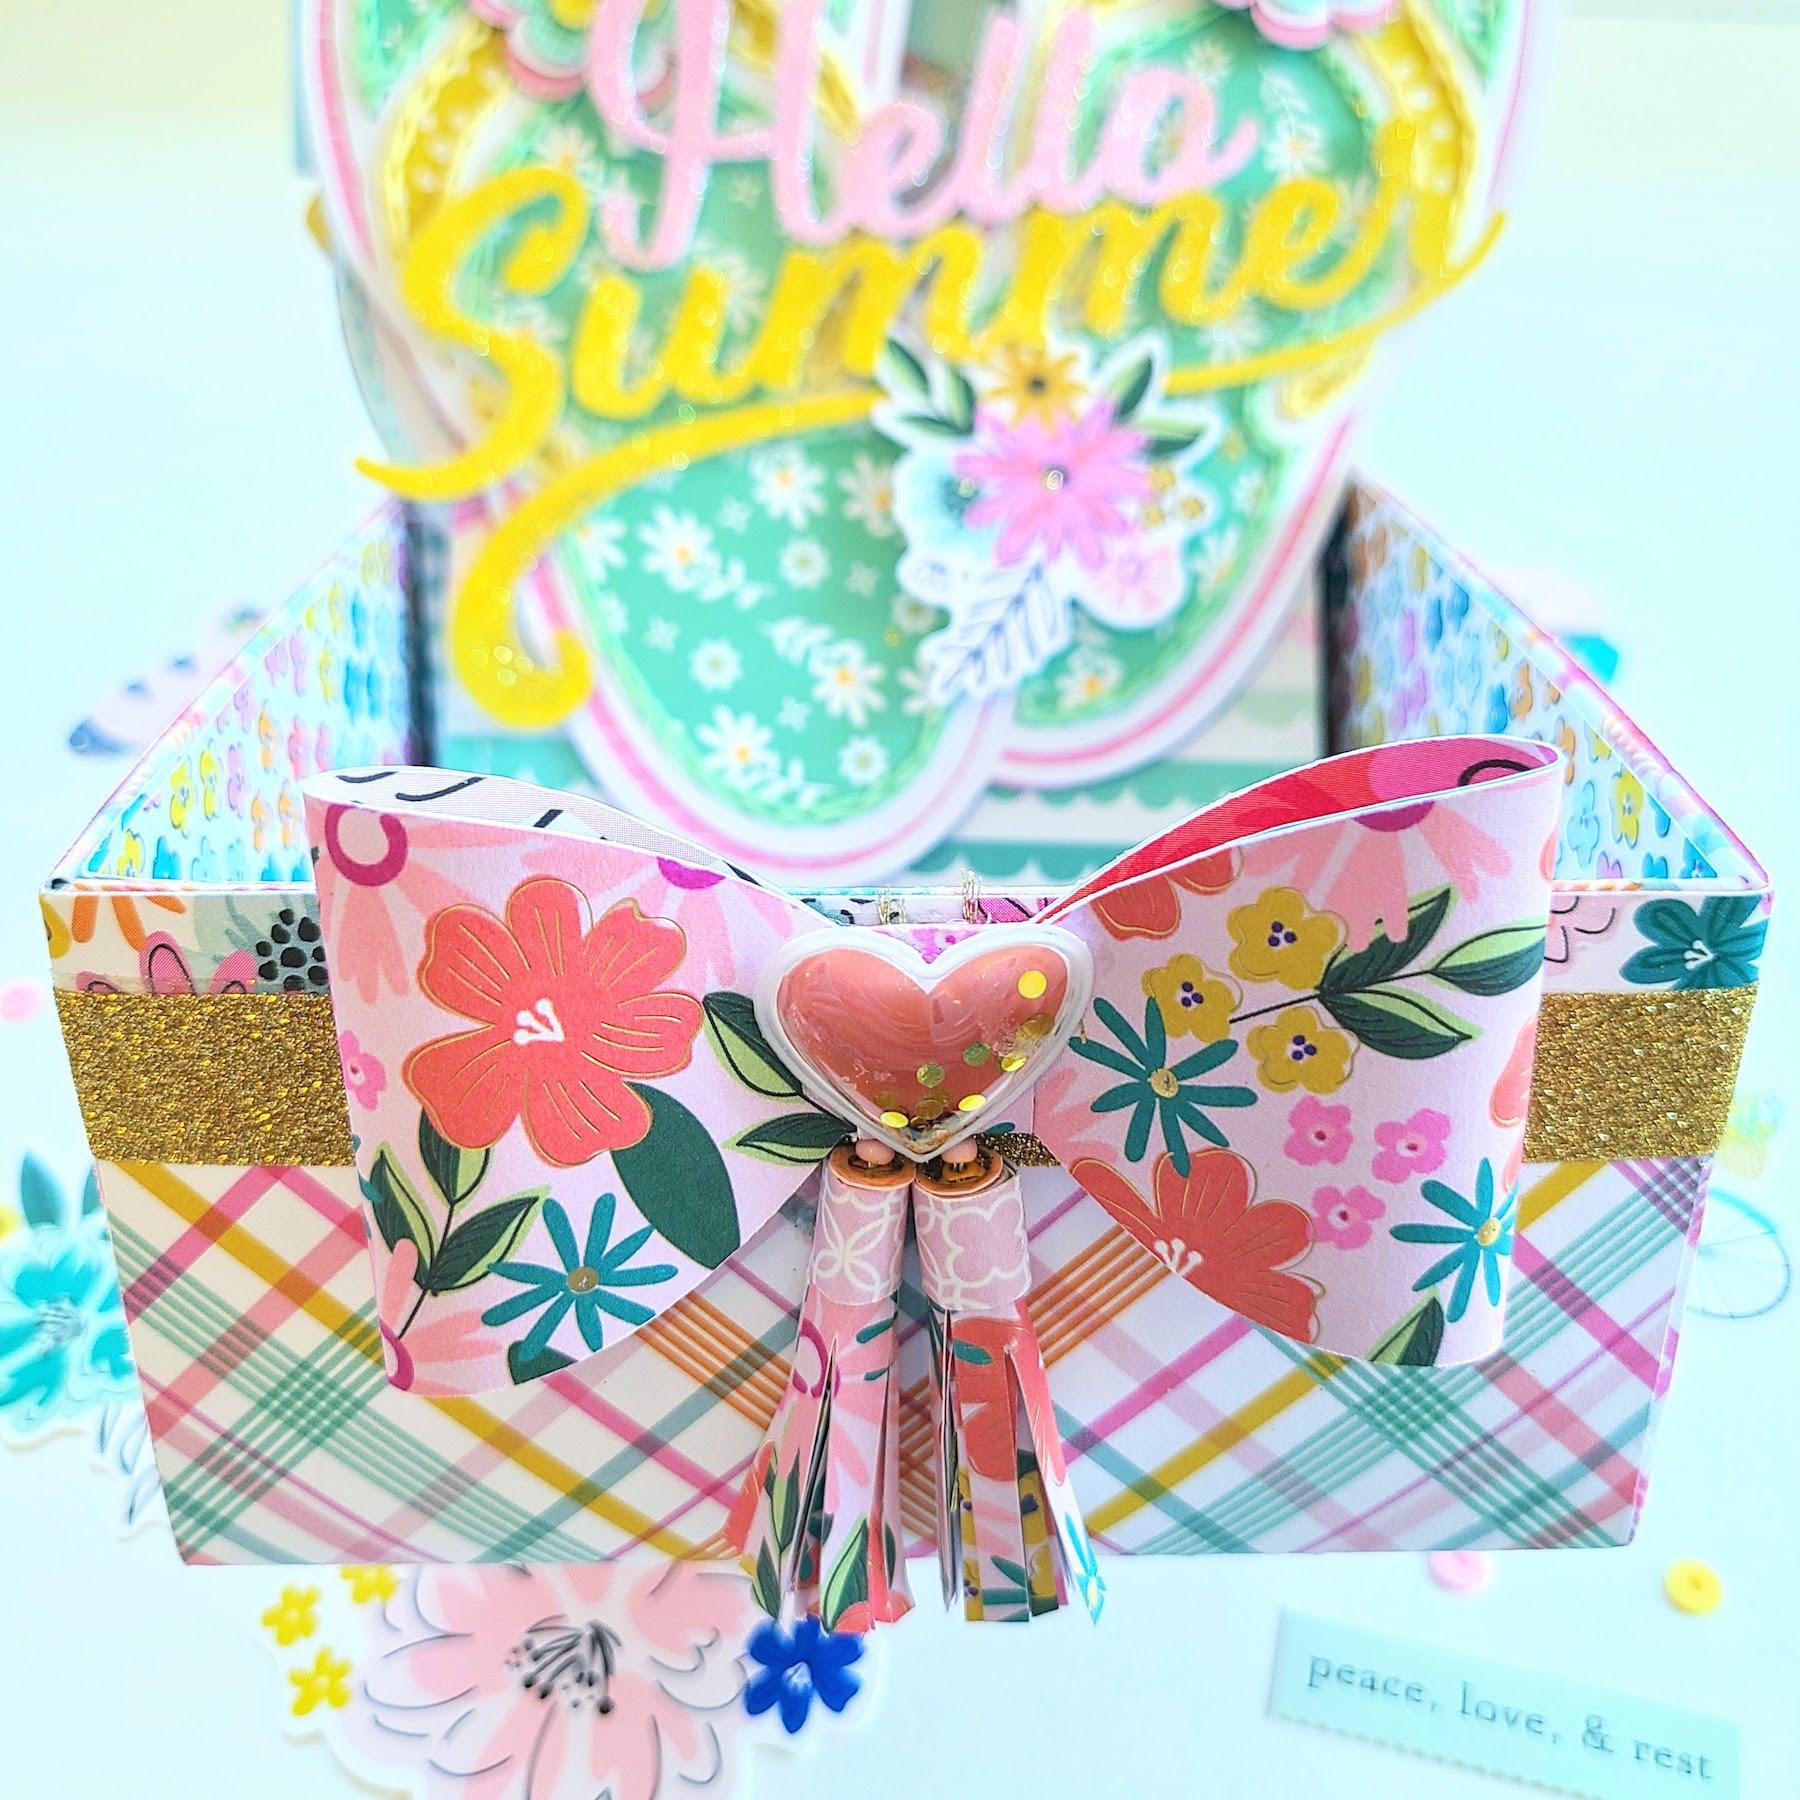 KMI-Memorybox Card 4 Hello Summer 3